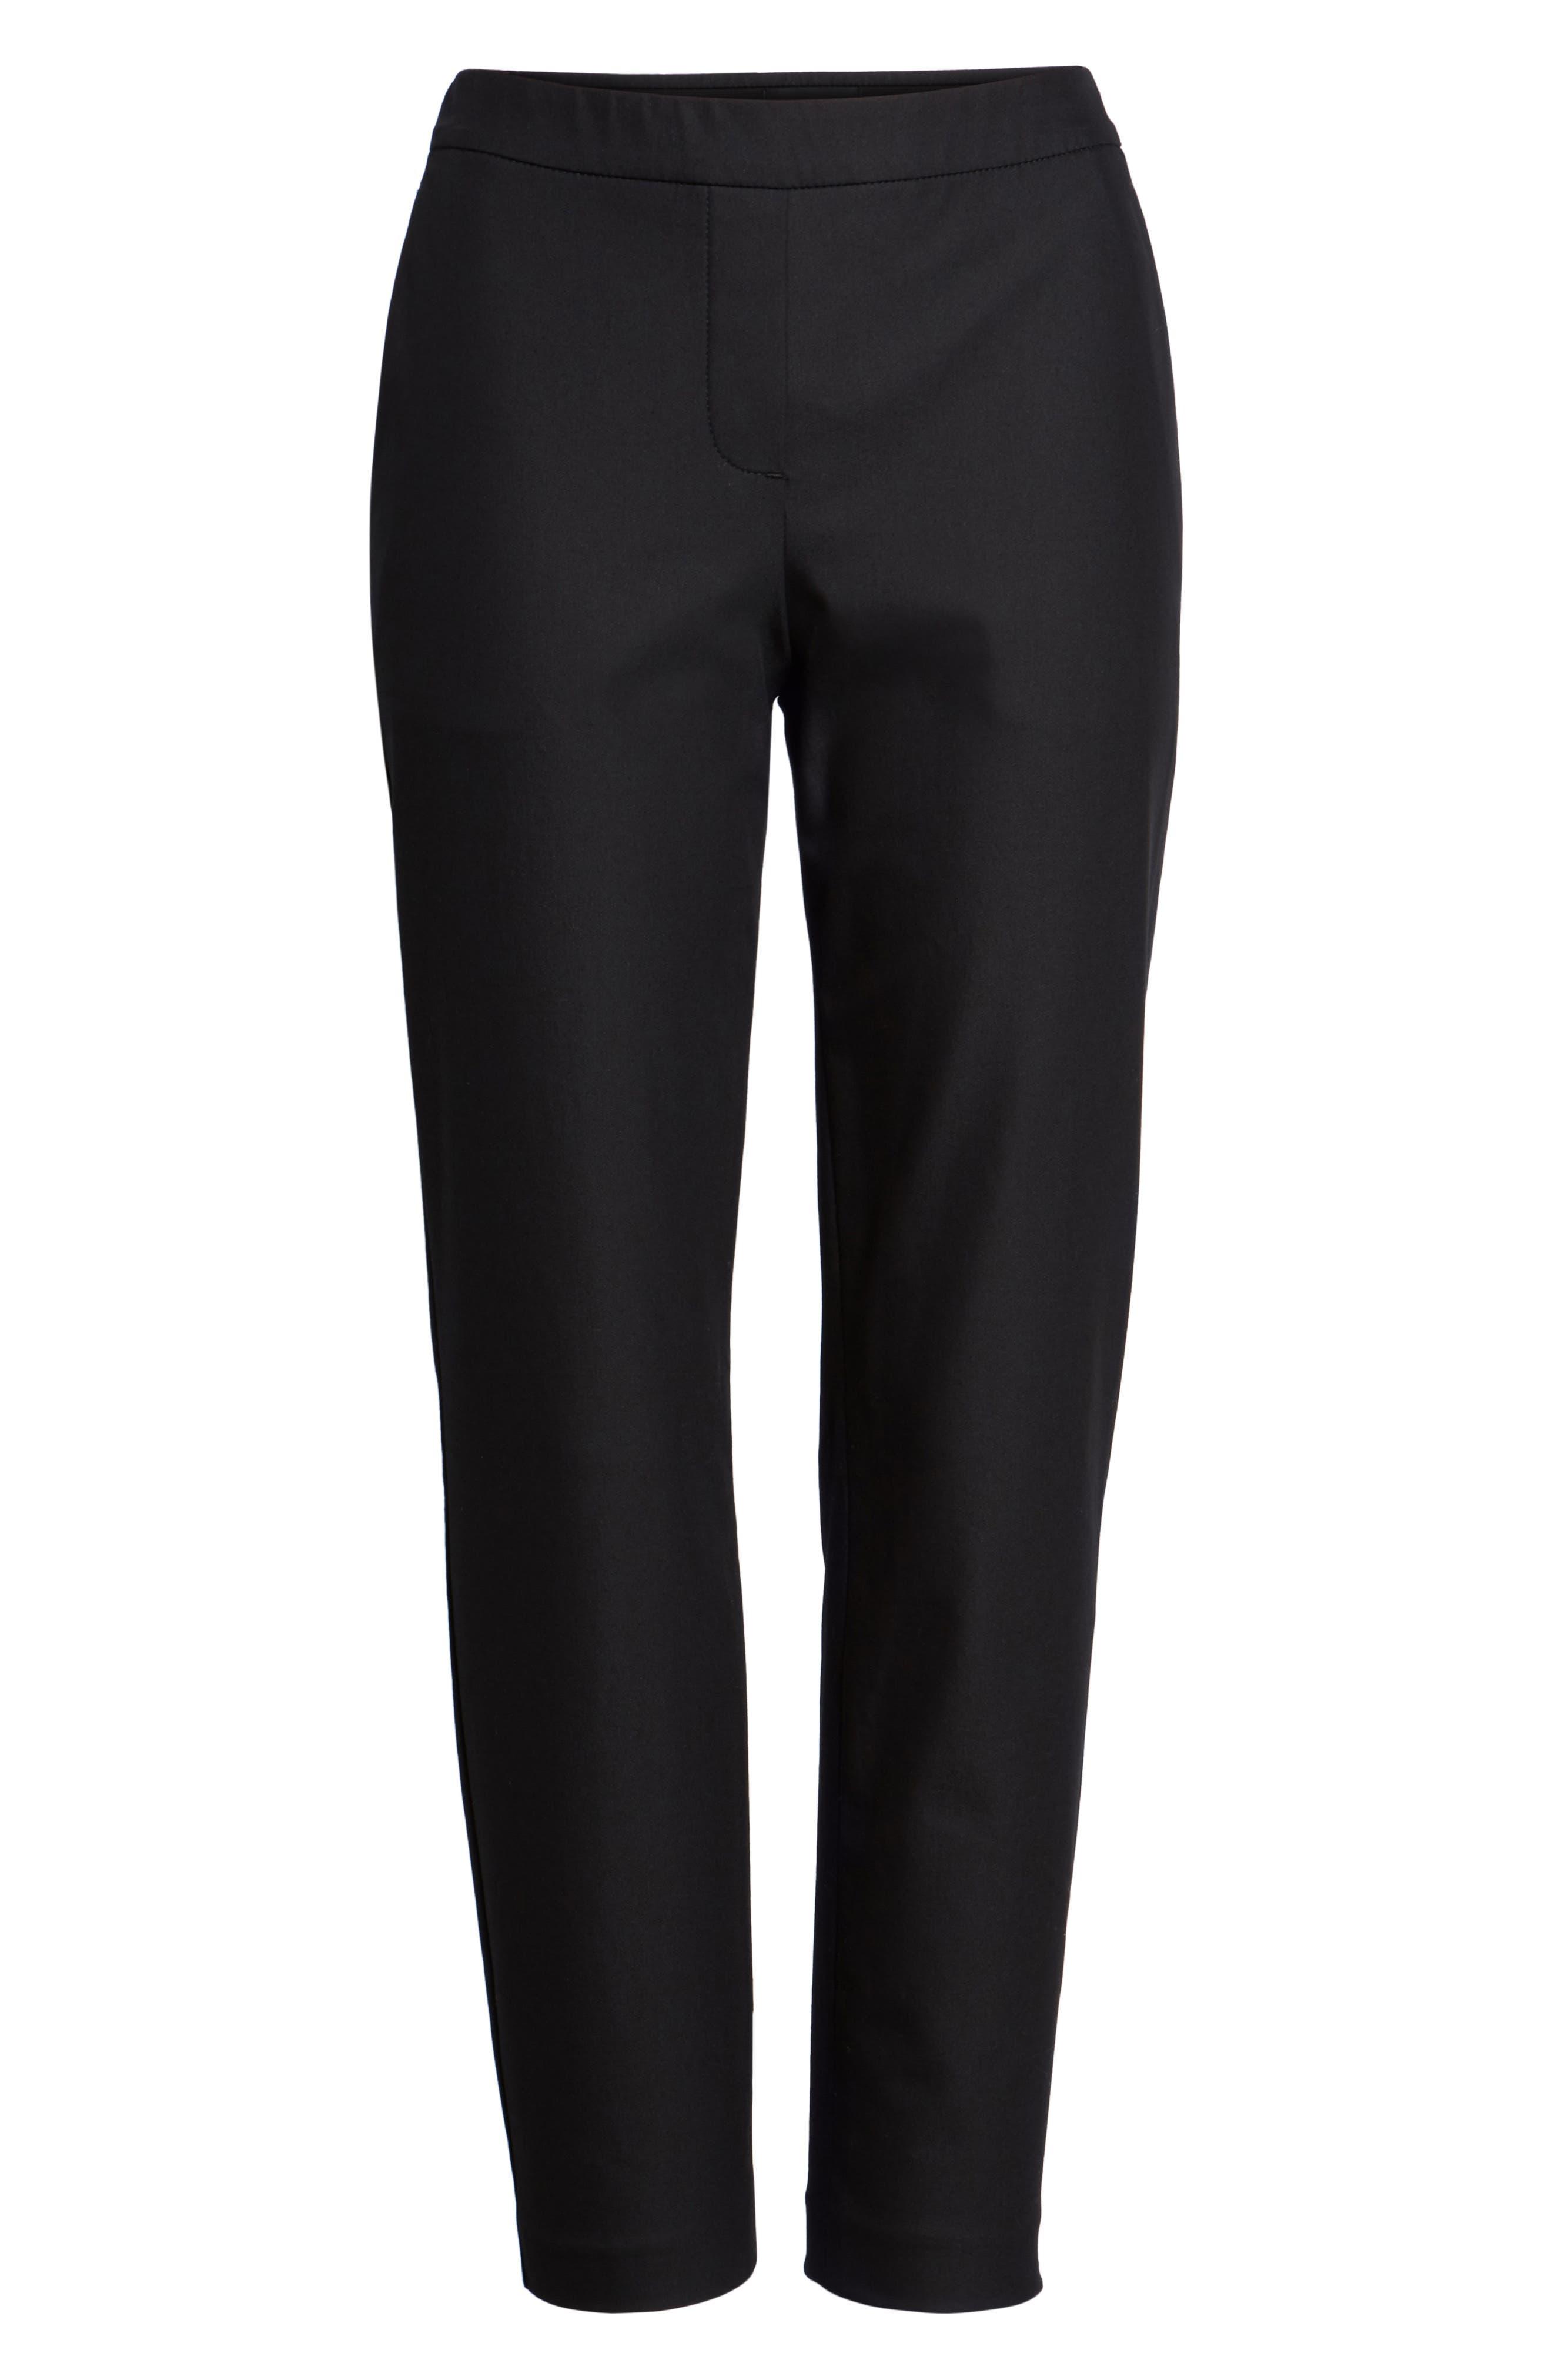 THEORY, 'Thaniel' Trousers, Main thumbnail 1, color, BLACK